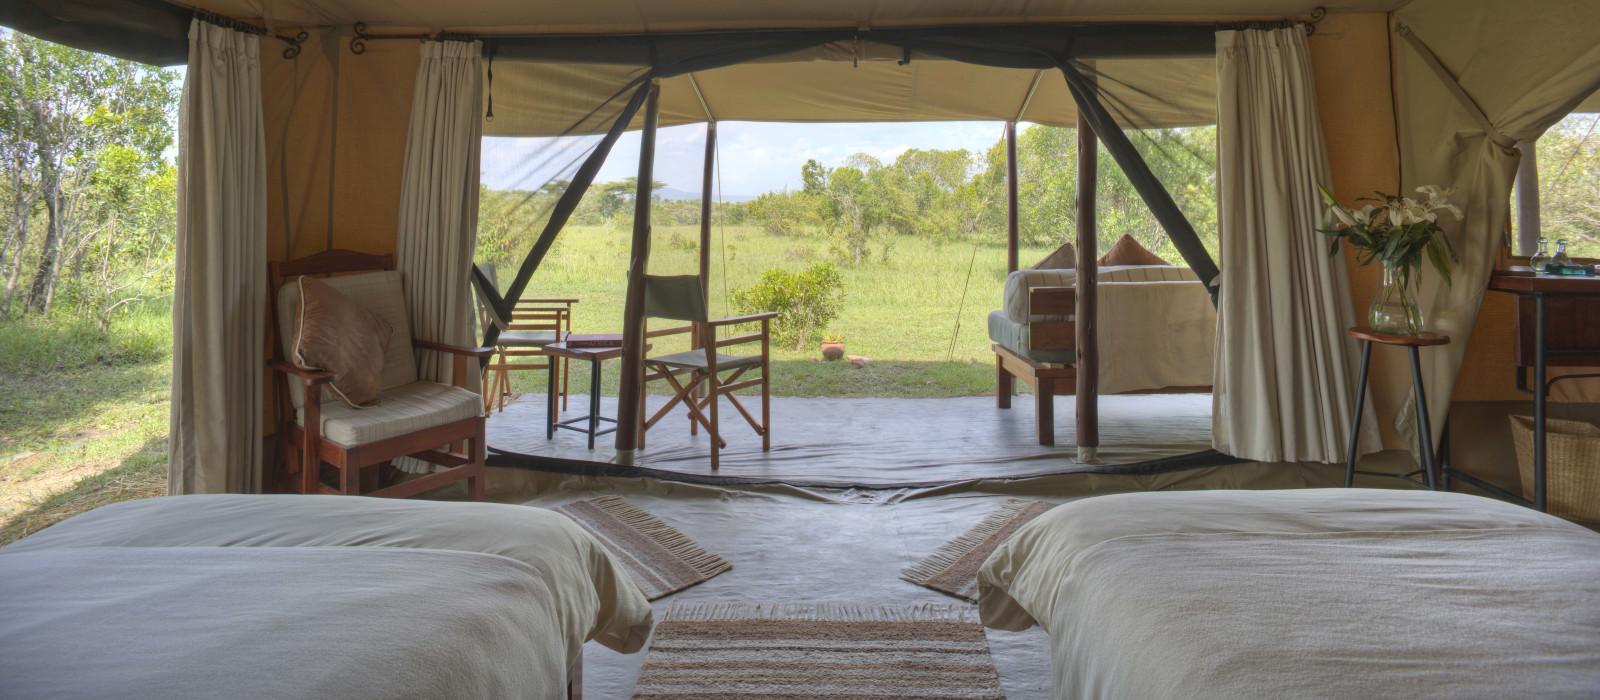 Hotel Encounter Mara Kenia